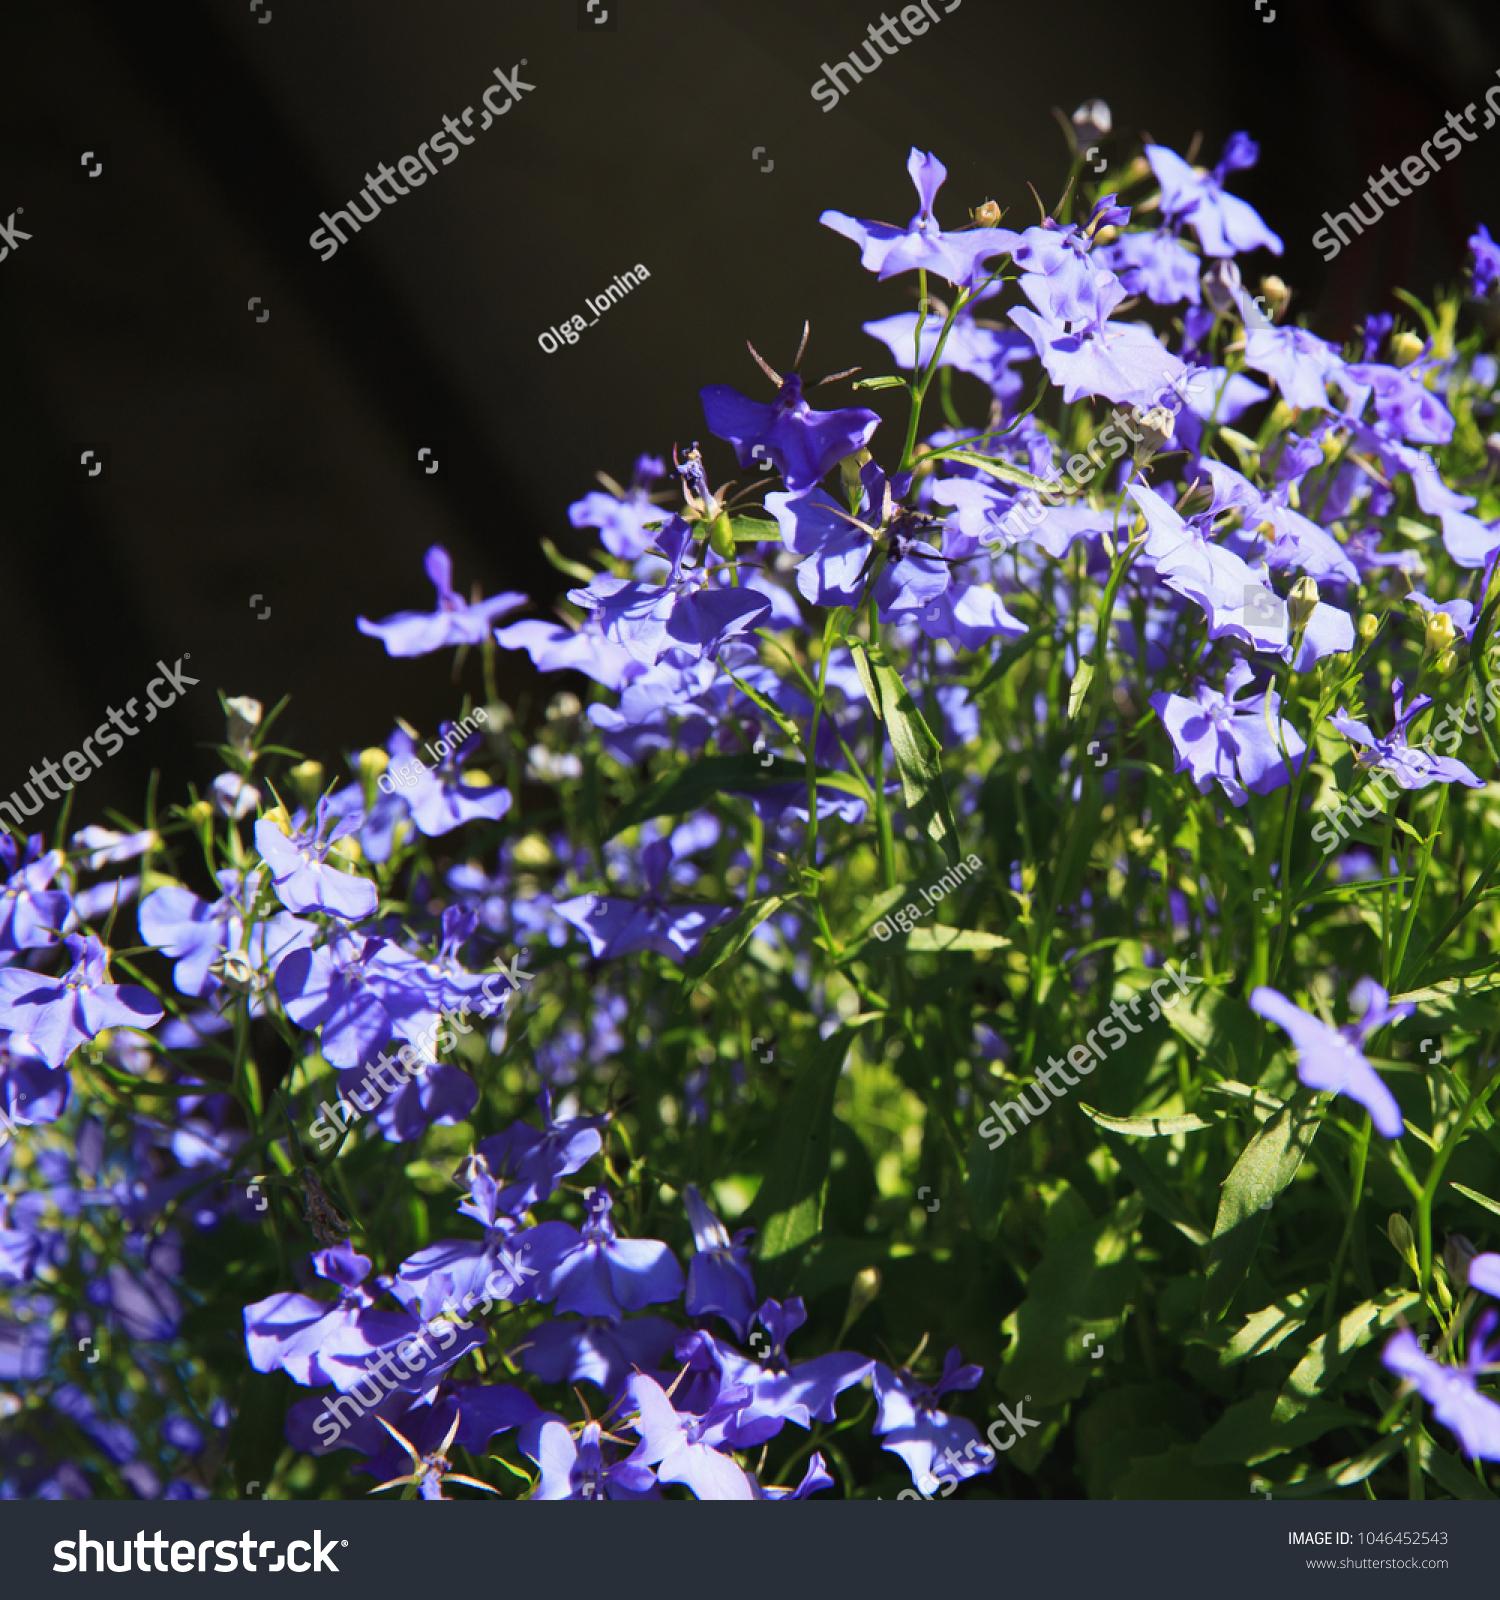 Blue trailing lobelia sapphire flowers edging stock photo edit now blue trailing lobelia sapphire flowers or edging lobelia garden lobelia latin name lobelia erinus izmirmasajfo